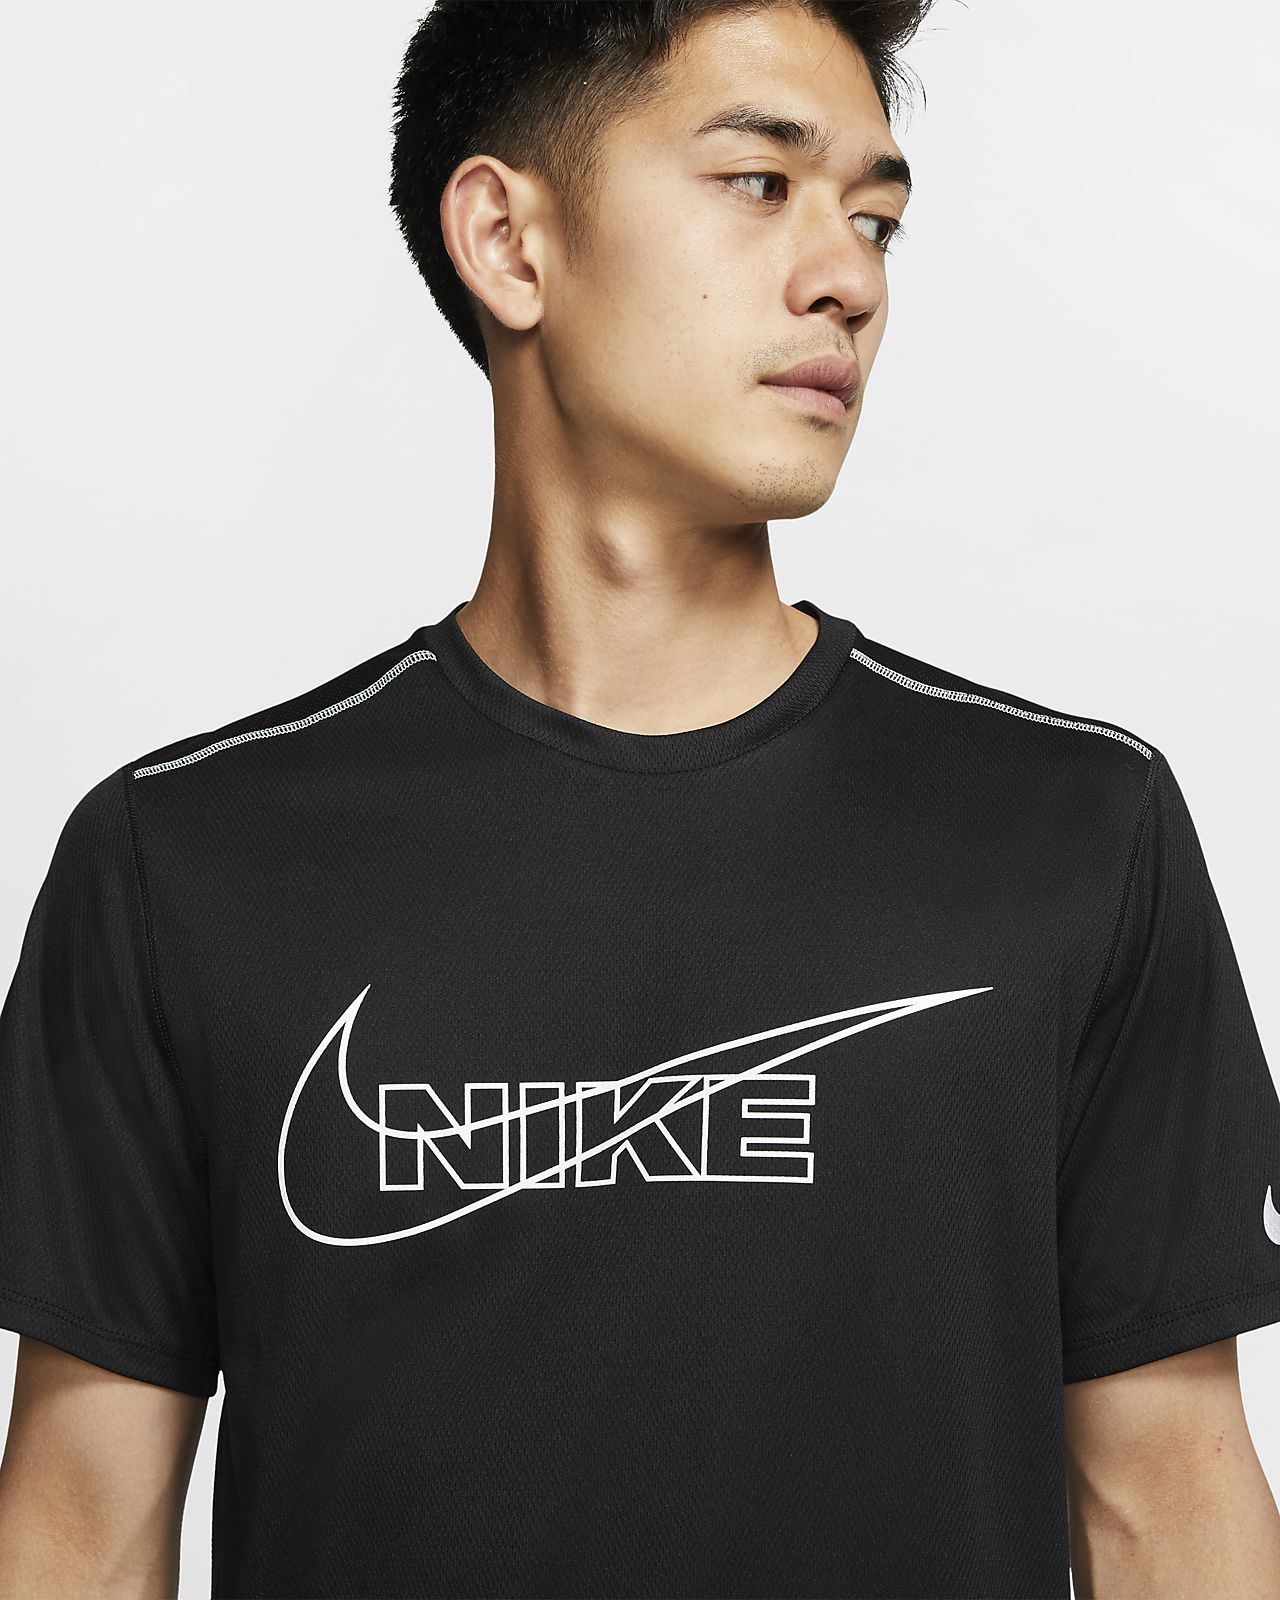 Nike Breathe Men's Short Sleeve Running Top